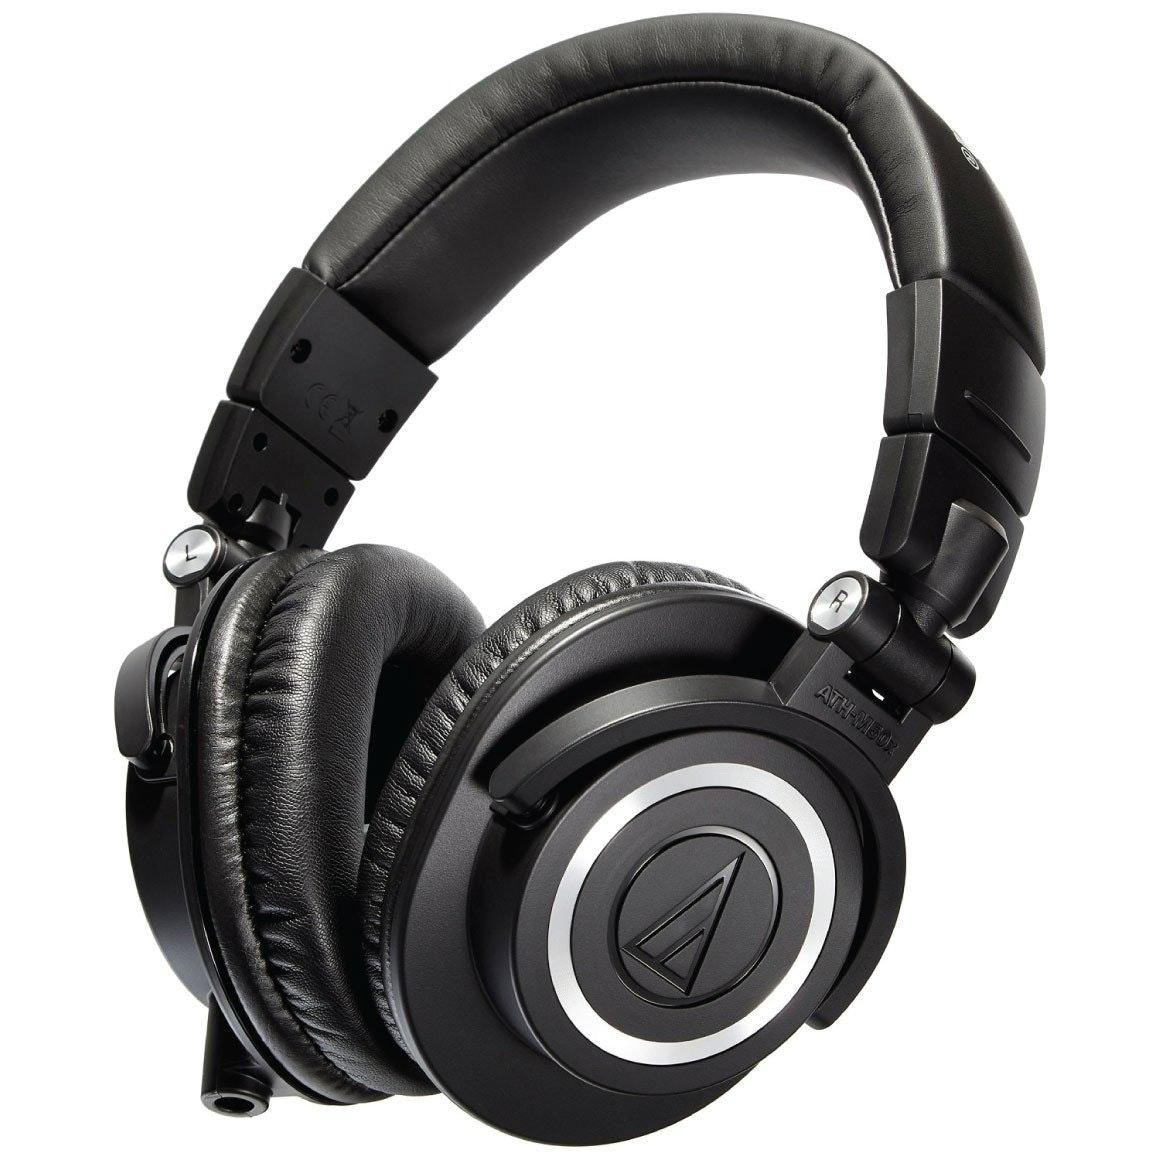 ATH-M50x Professional Monitor Headphones || Audio-Technica US